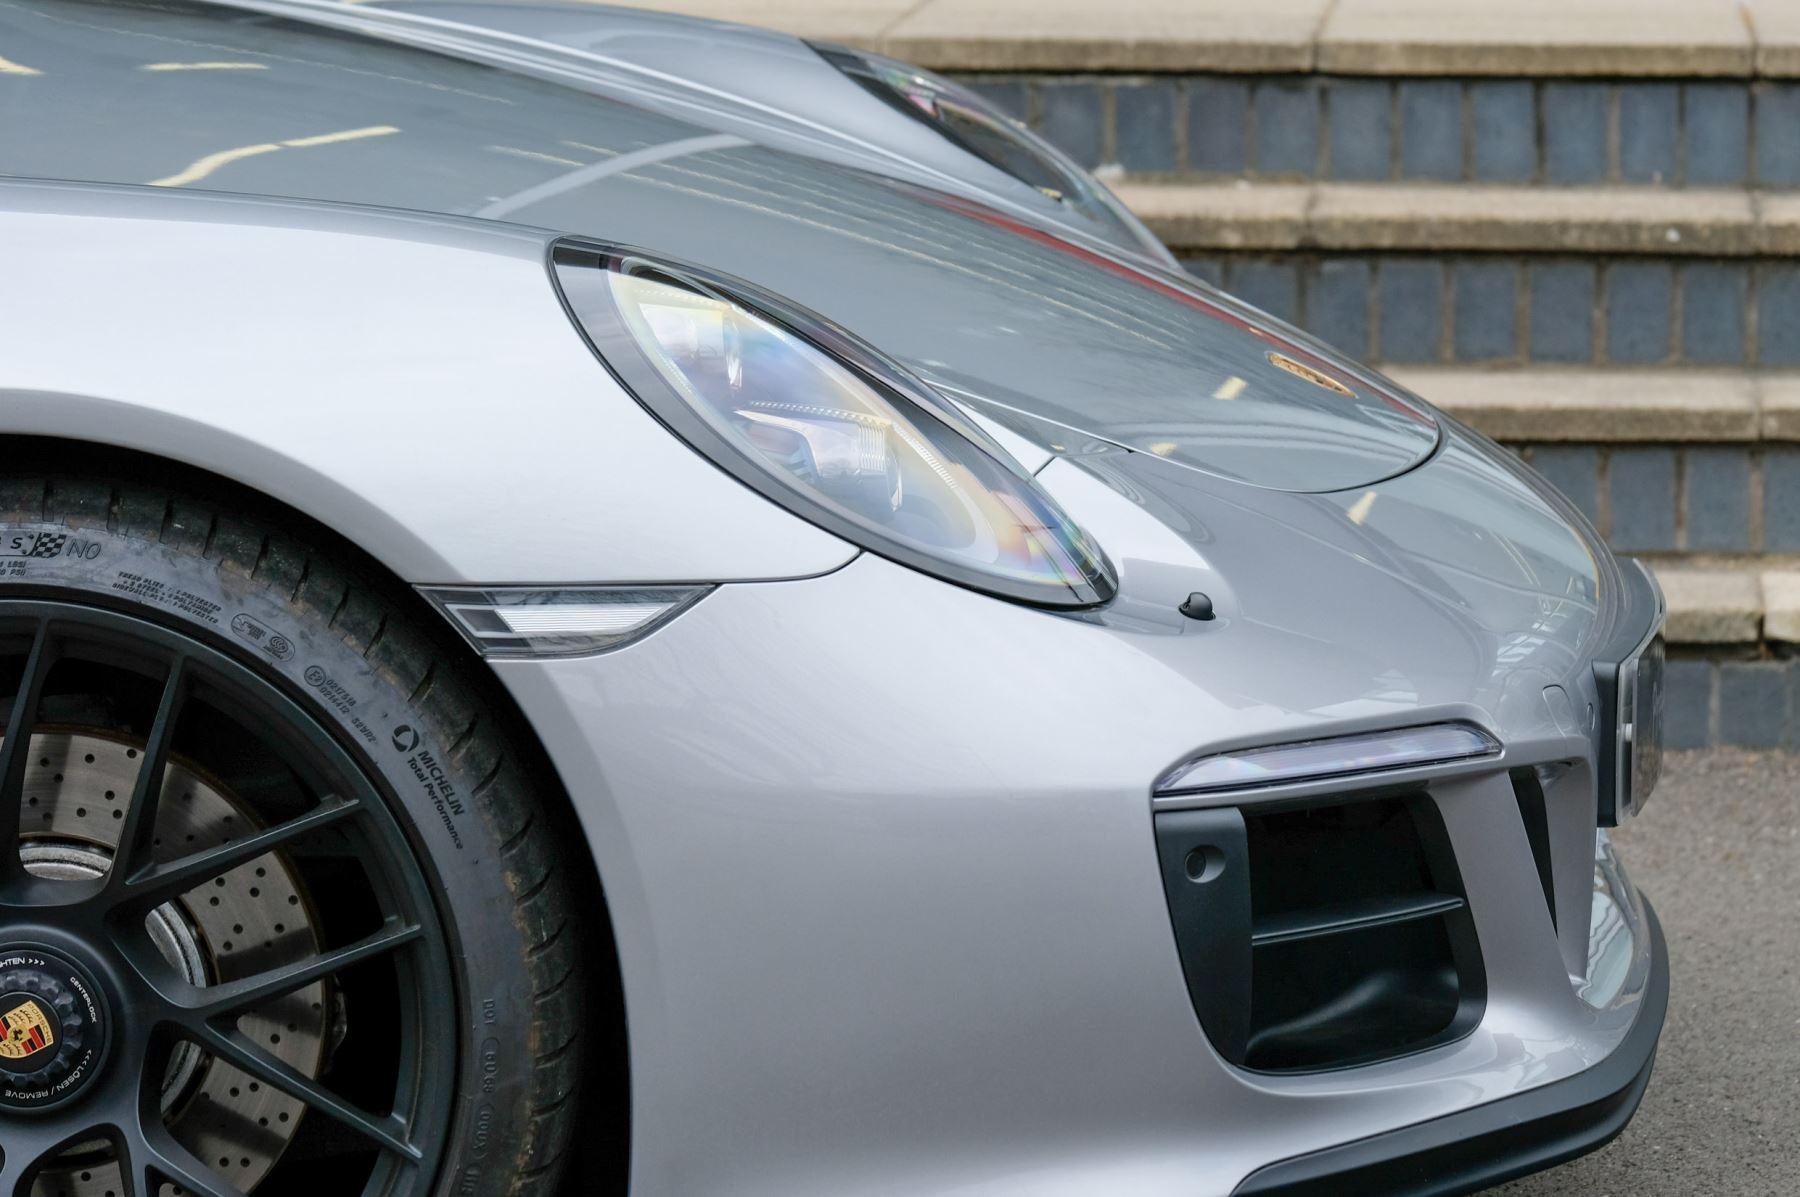 Porsche 911 TARGA 4 GTS - PDK - SPORT DESIGN PACKAGE - GTS INTERIOR PACKAGE image 9